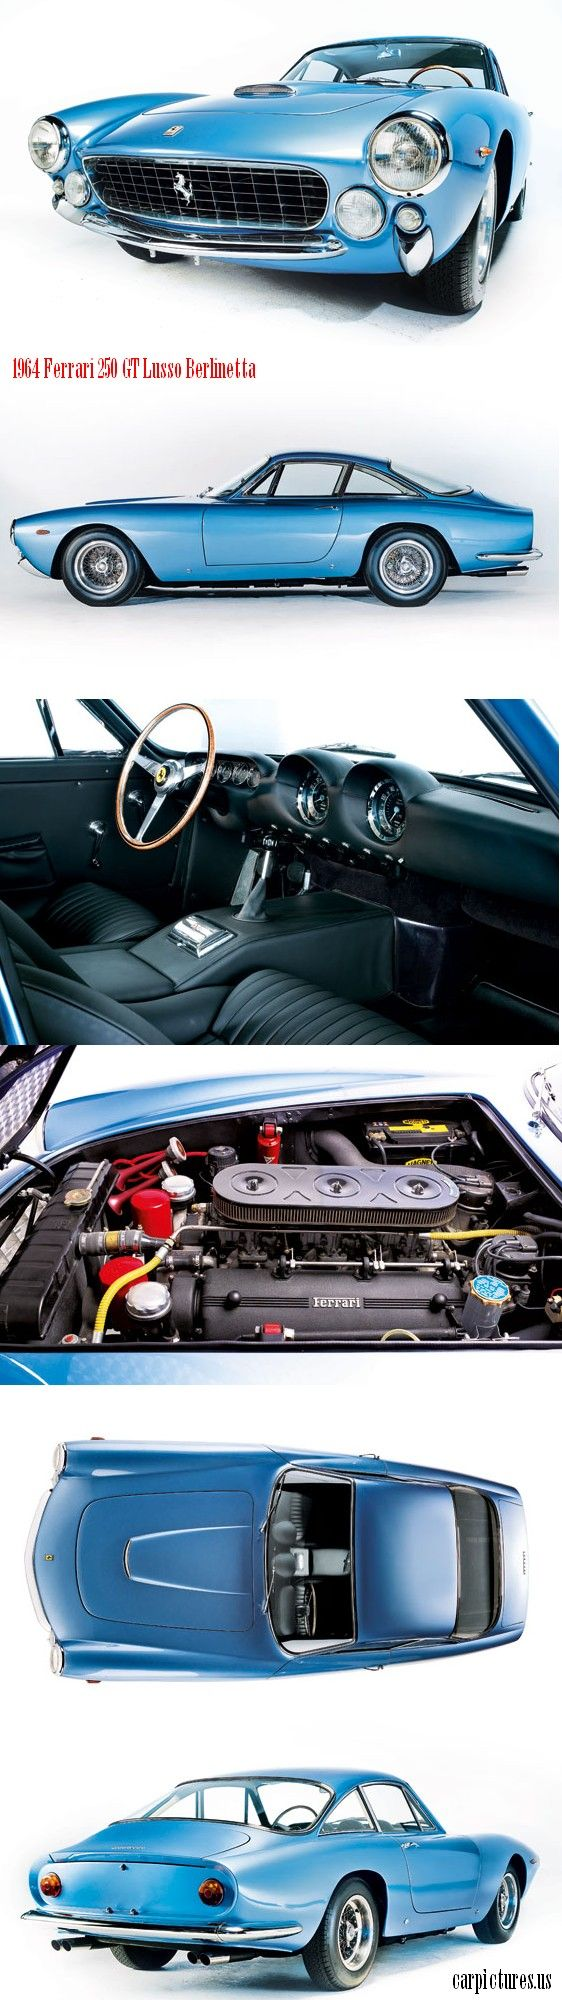 Ferrari 250 GT/ 1964                                                                                                                                                                                 Más